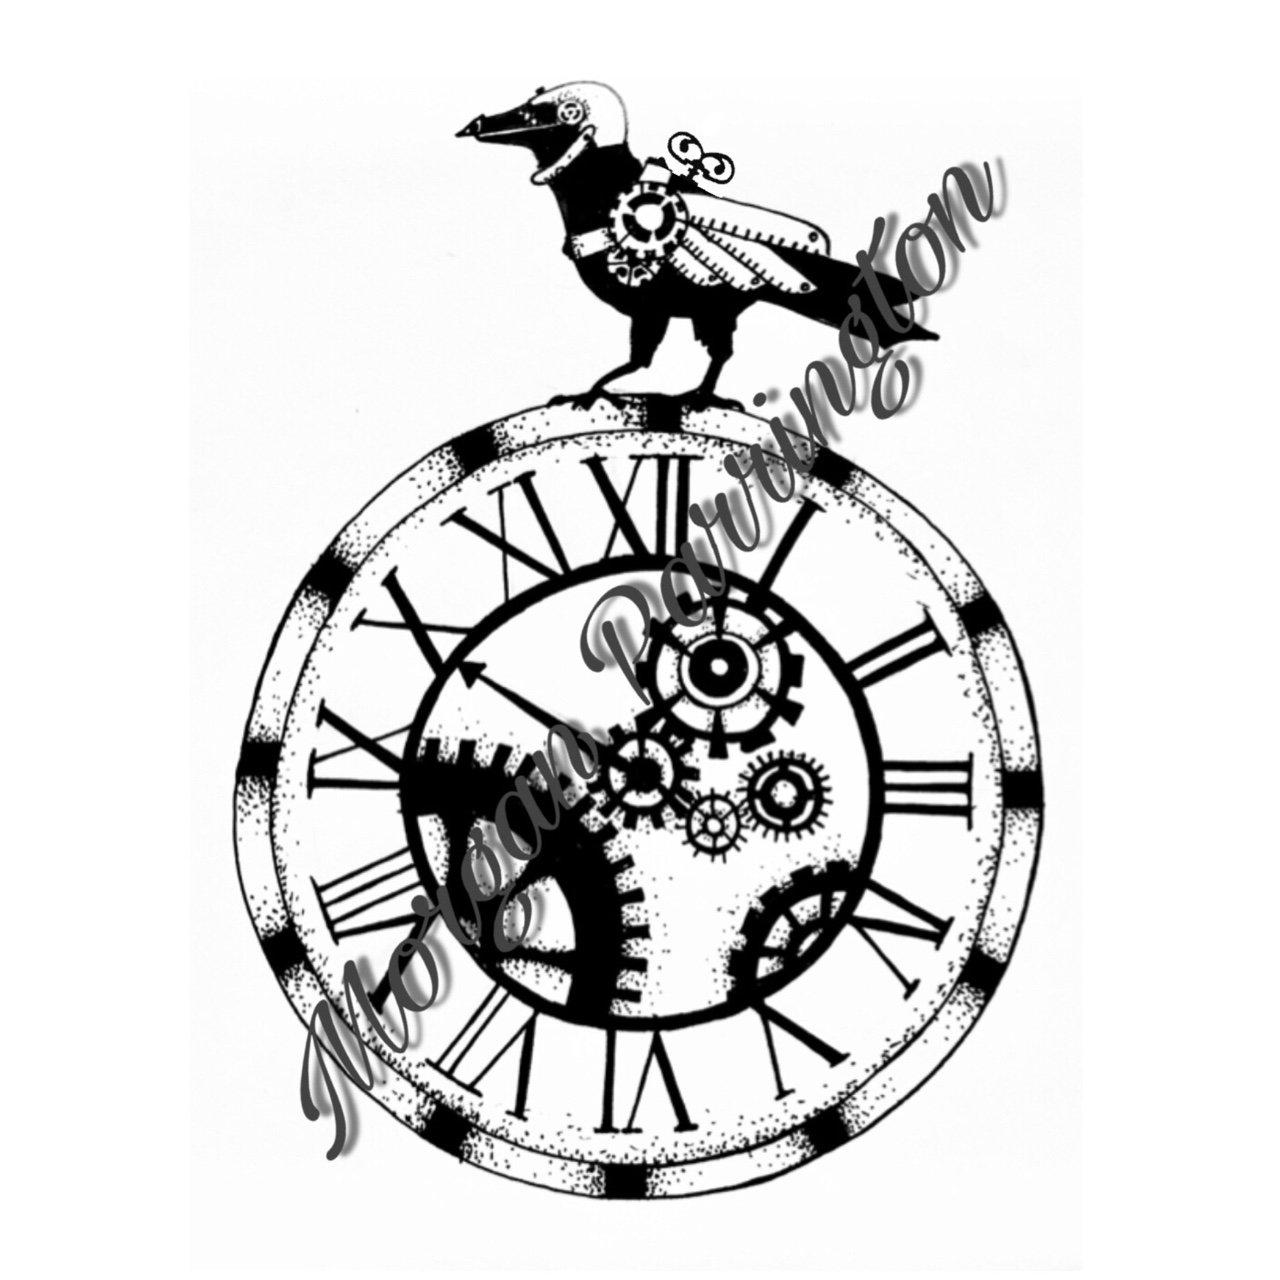 1280x1280 Original Steampunk Clock Face And Crow